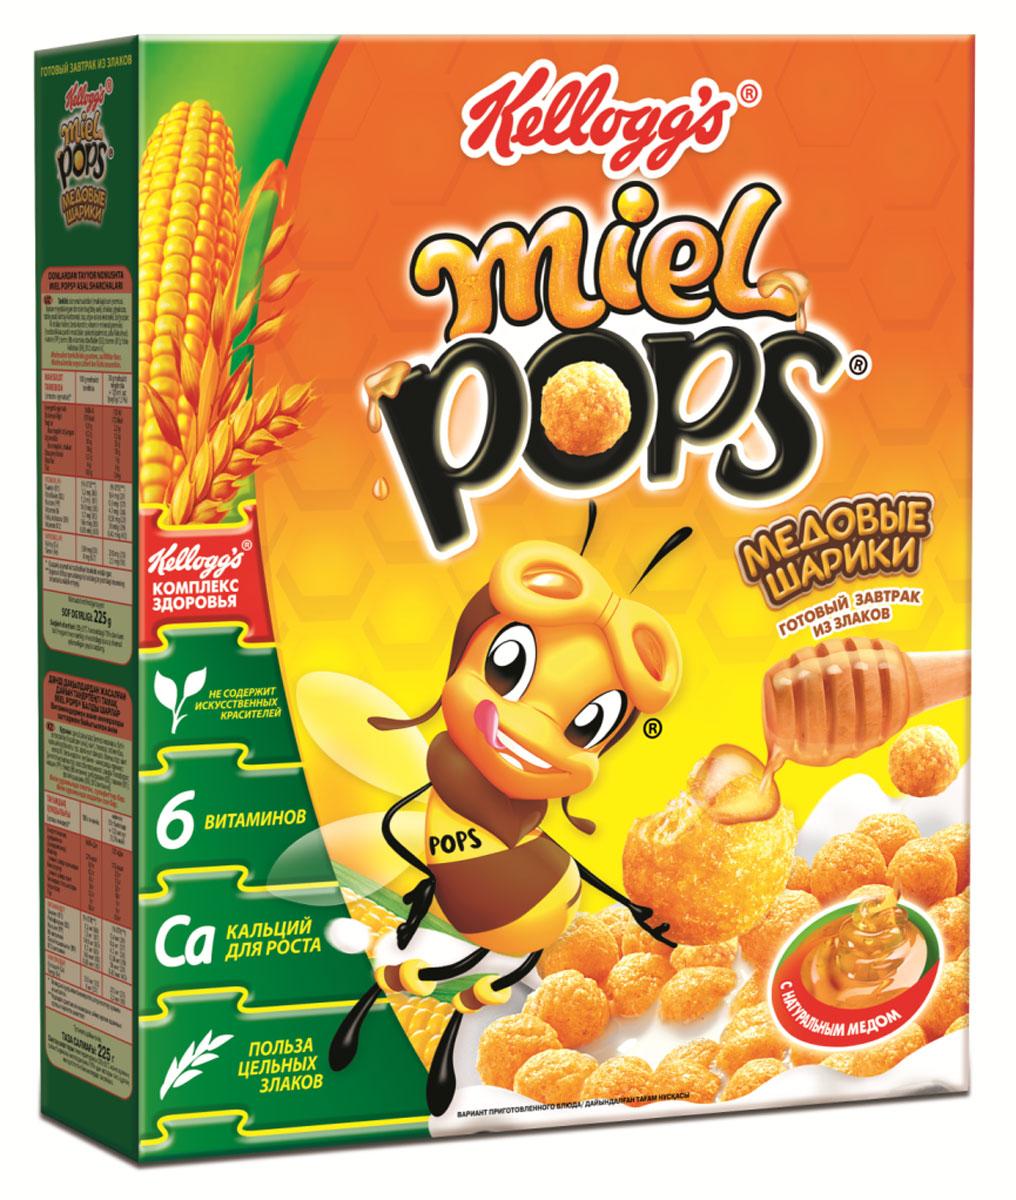 Miel Pops Готовый завтрак